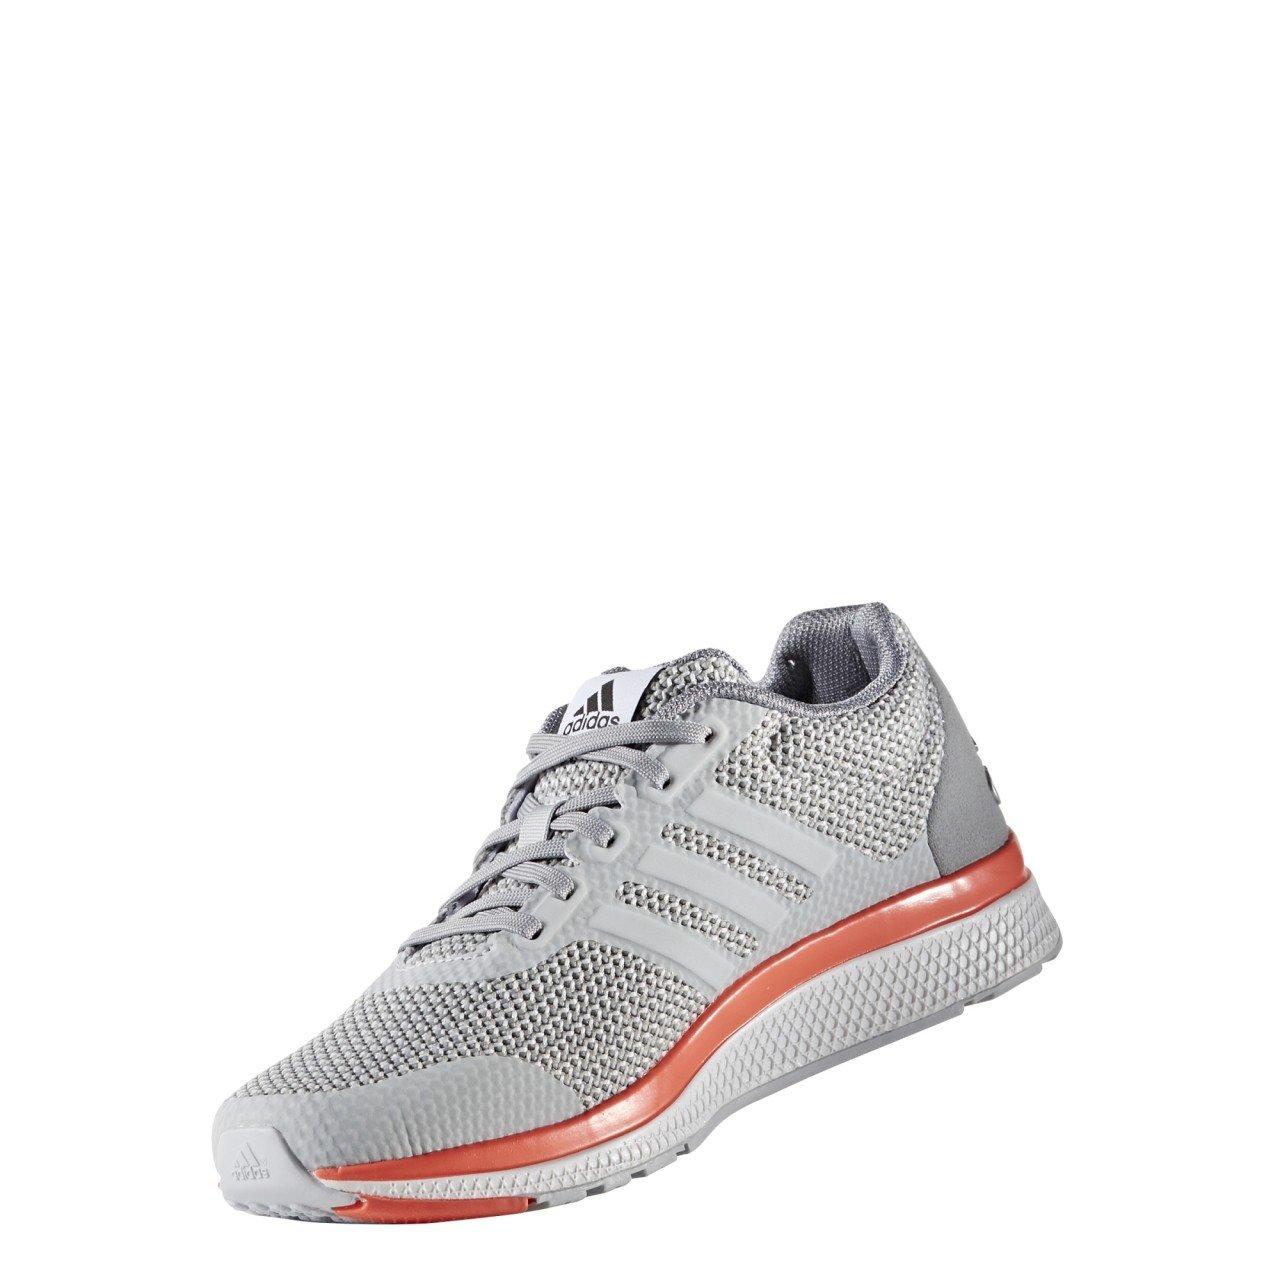 Adidas Damen Lightster Bounce Laufschuhe W Laufschuhe Bounce Grau 13ce34